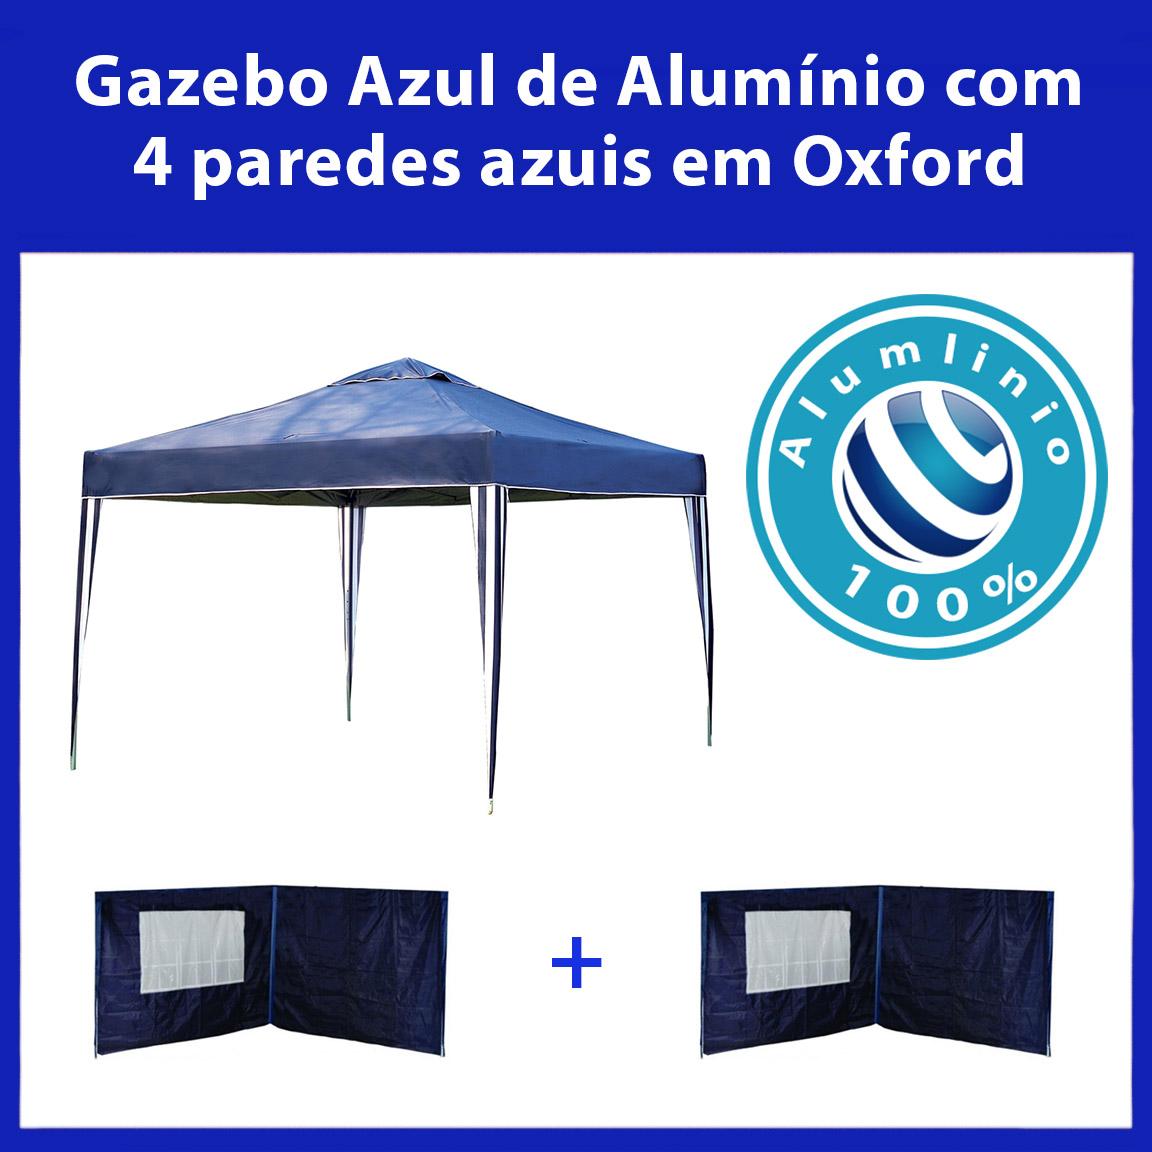 Gazebo 3x3 Articulado 100% Alumínio + 4 Paredes Azuis de Oxford Eleva Mundi - Azul